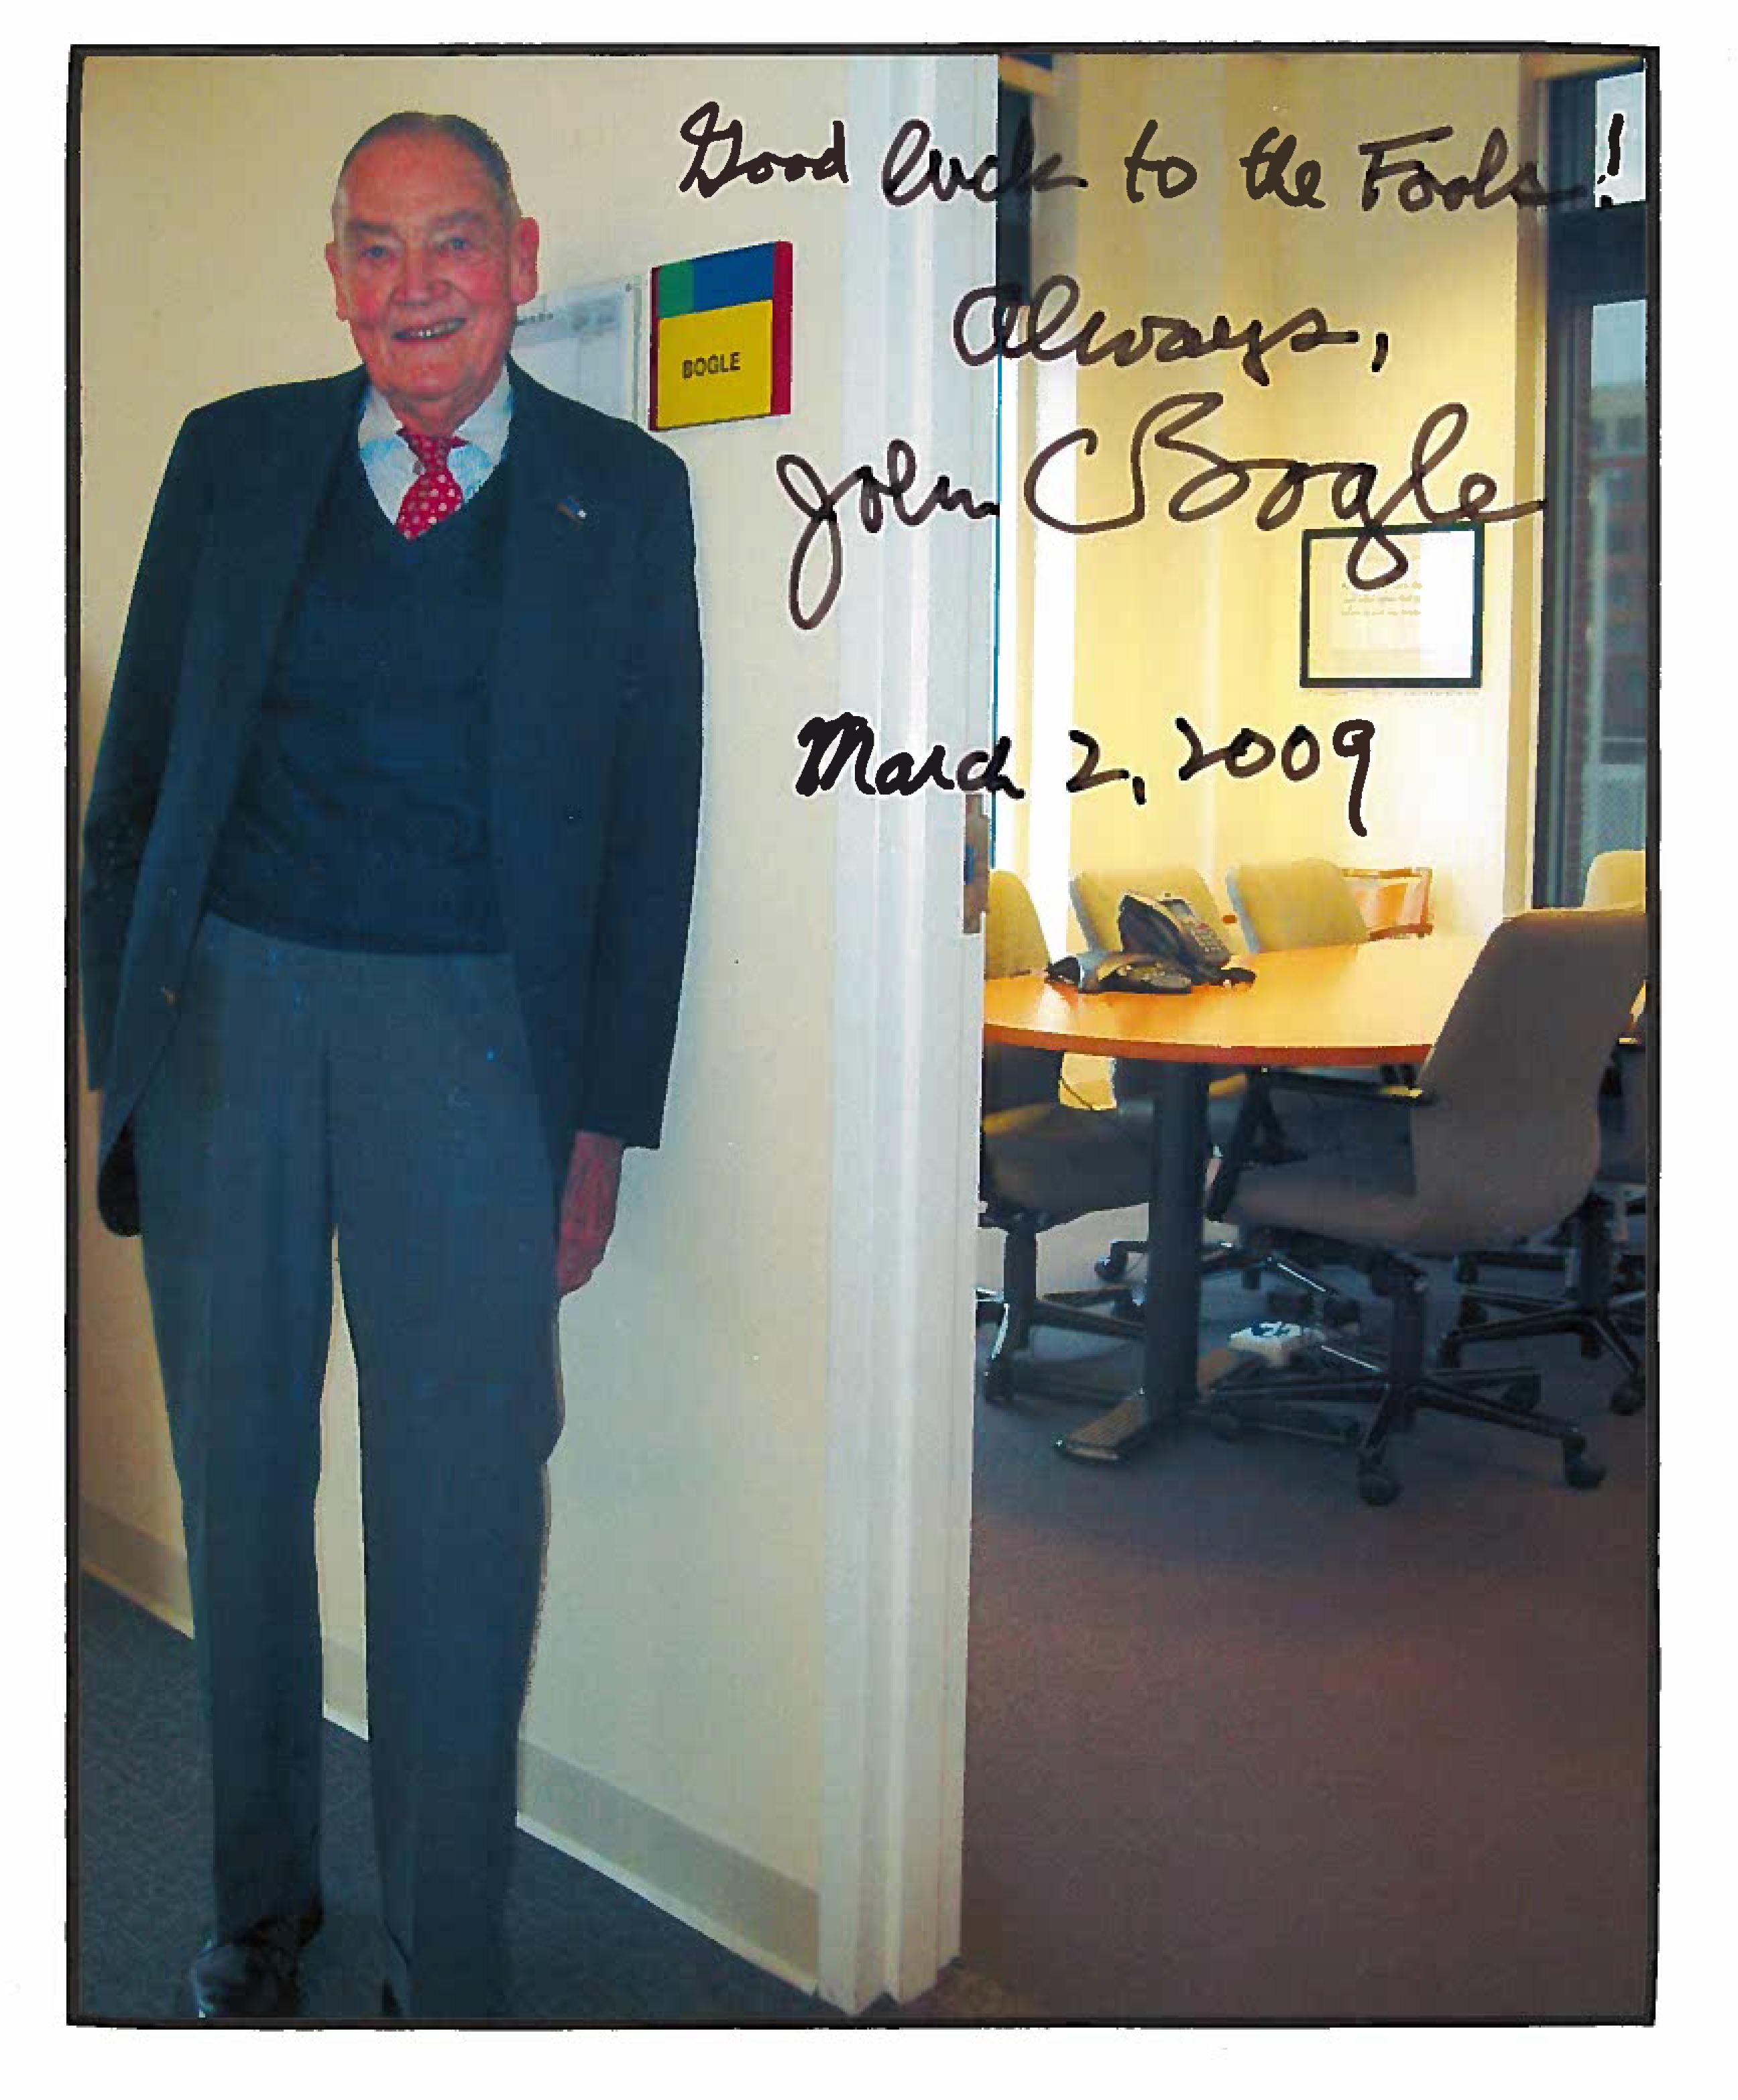 Jack Bogle standing outside The Motley Fool conference room named for him.